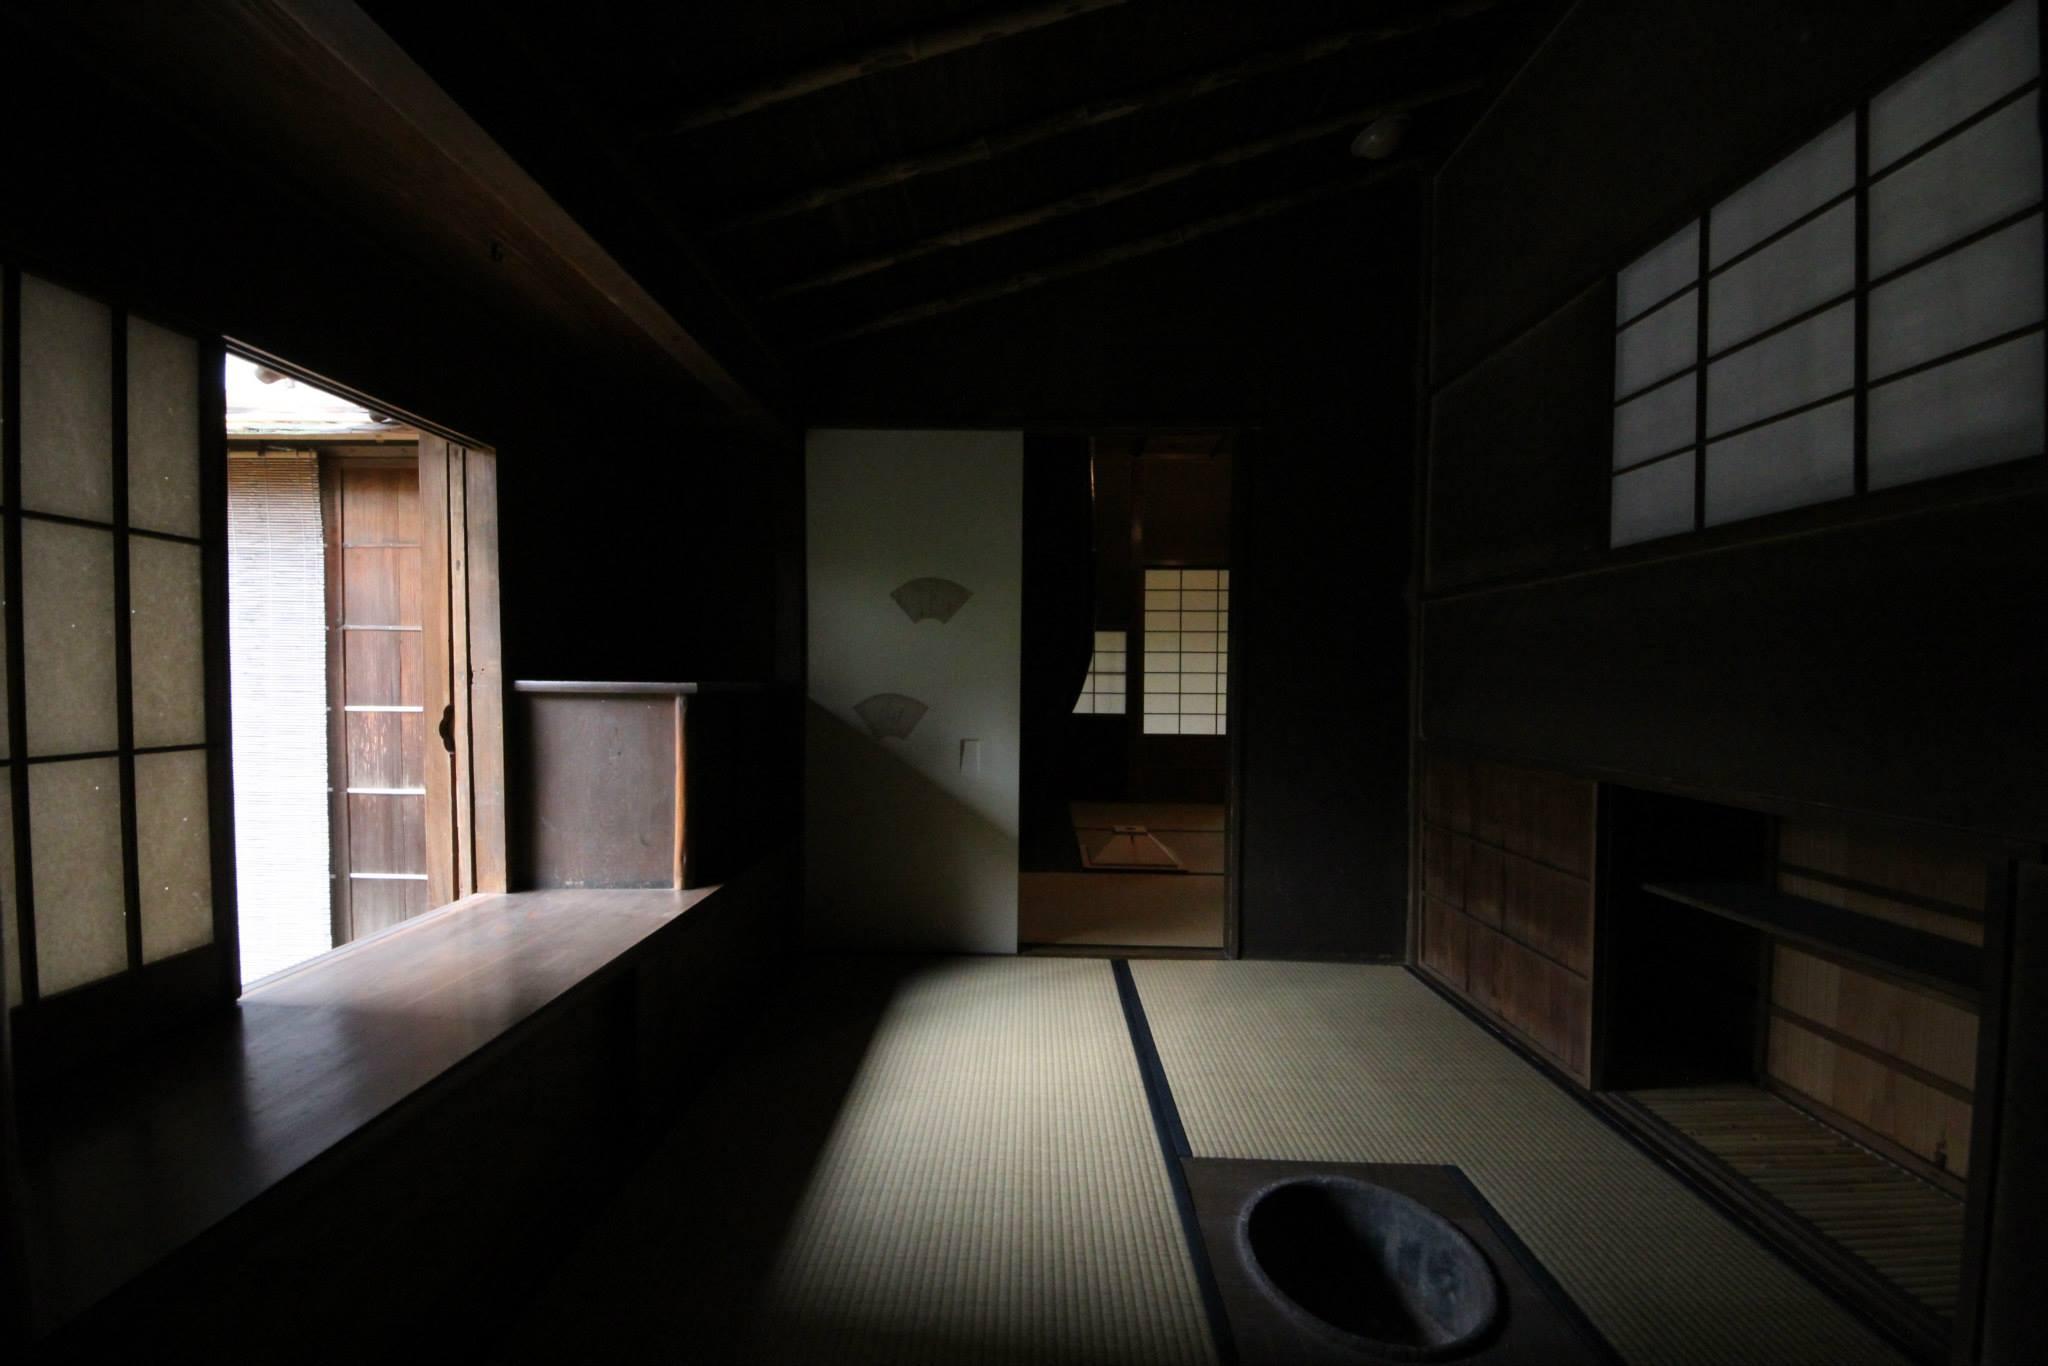 金沢 雨とお茶室│北陸建築旅_b0274159_15464073.jpg